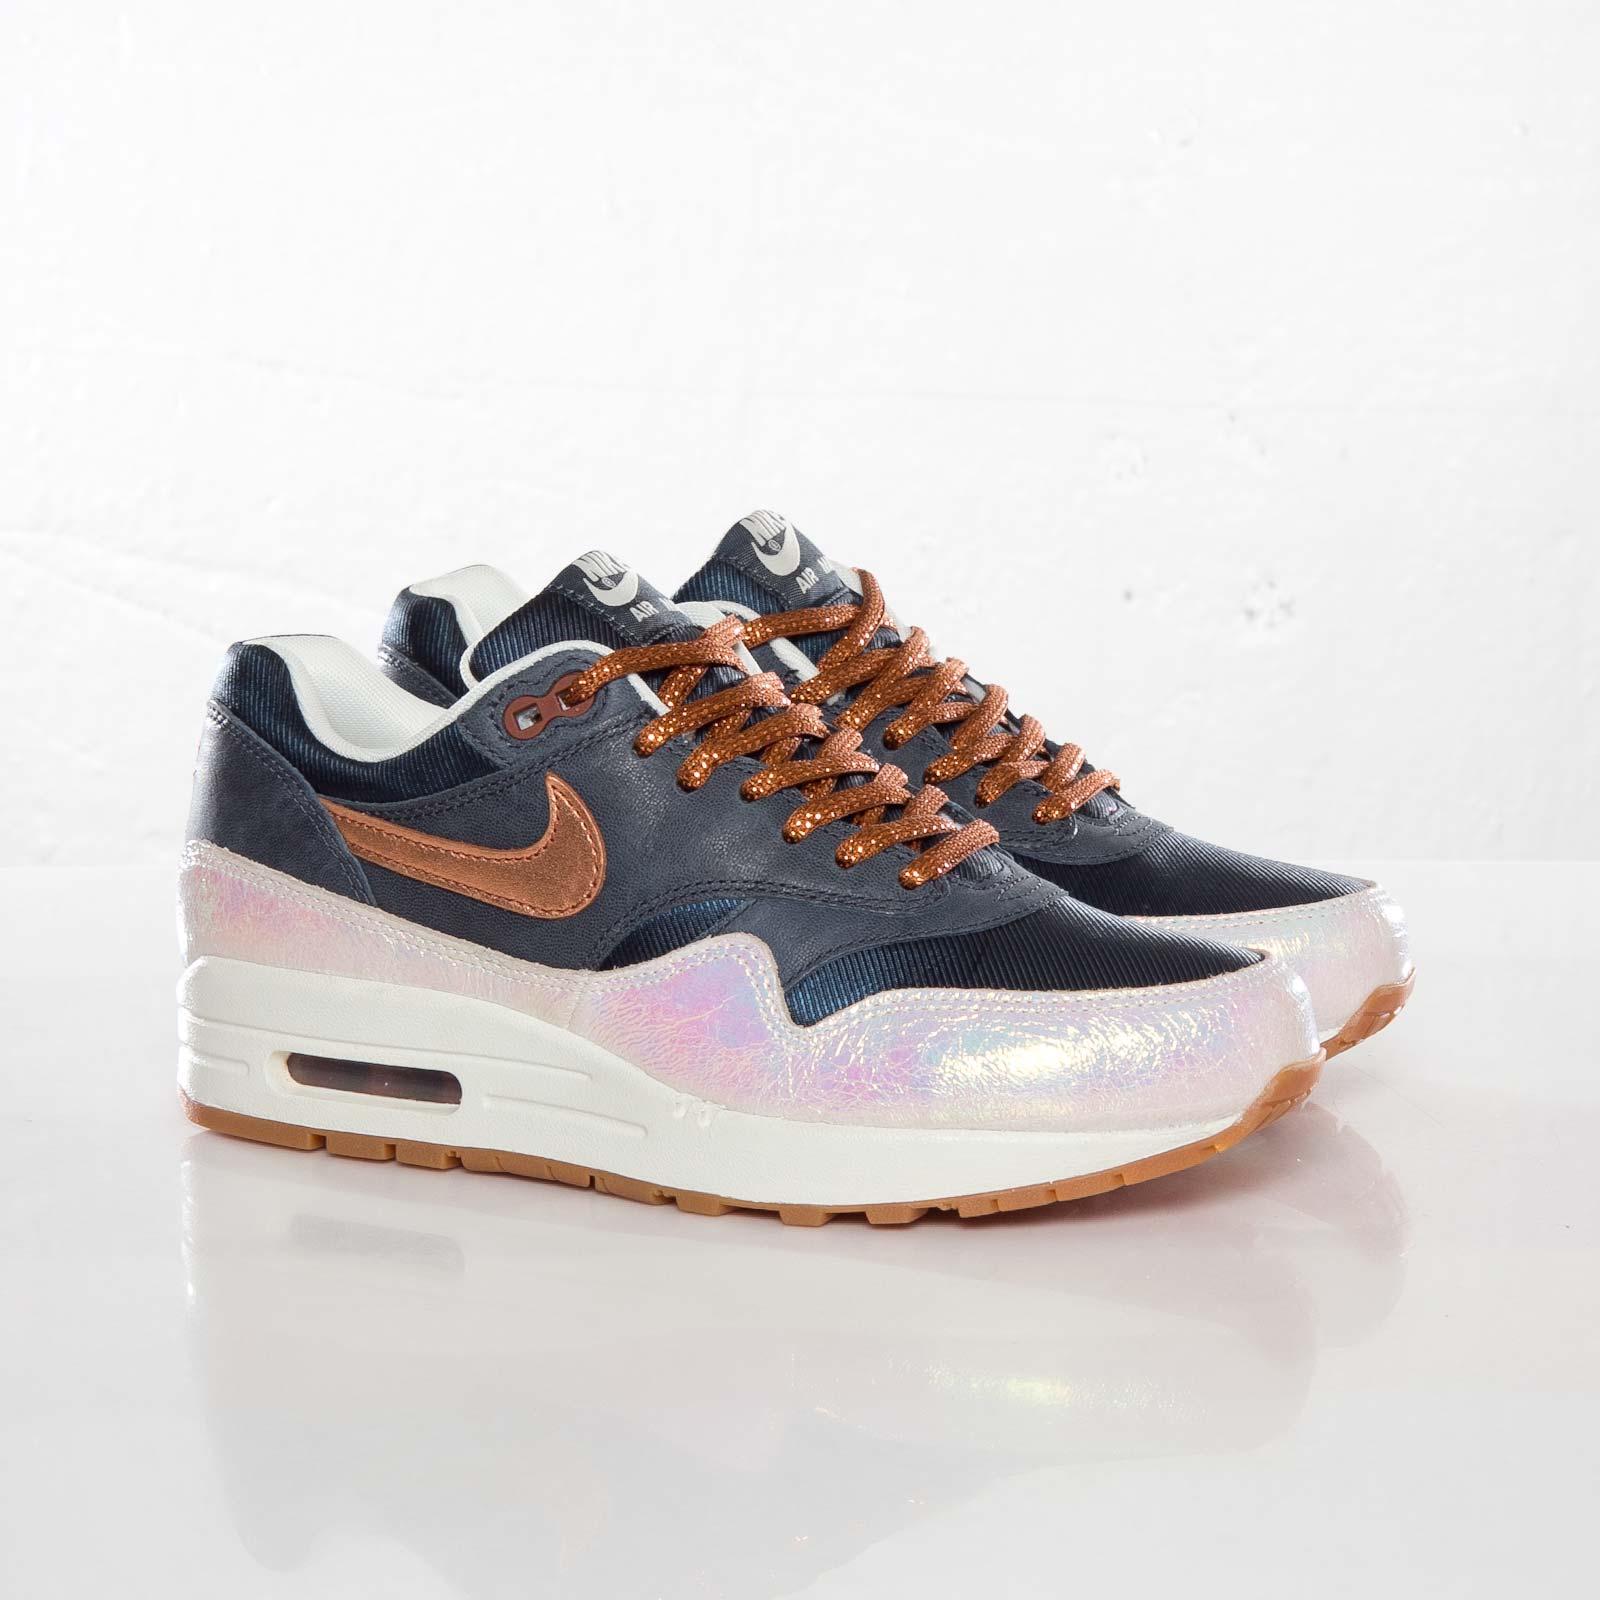 006b57ac73 Nike Wmns Air Max 1 Premium - 454746-400 - Sneakersnstuff | sneakers ...